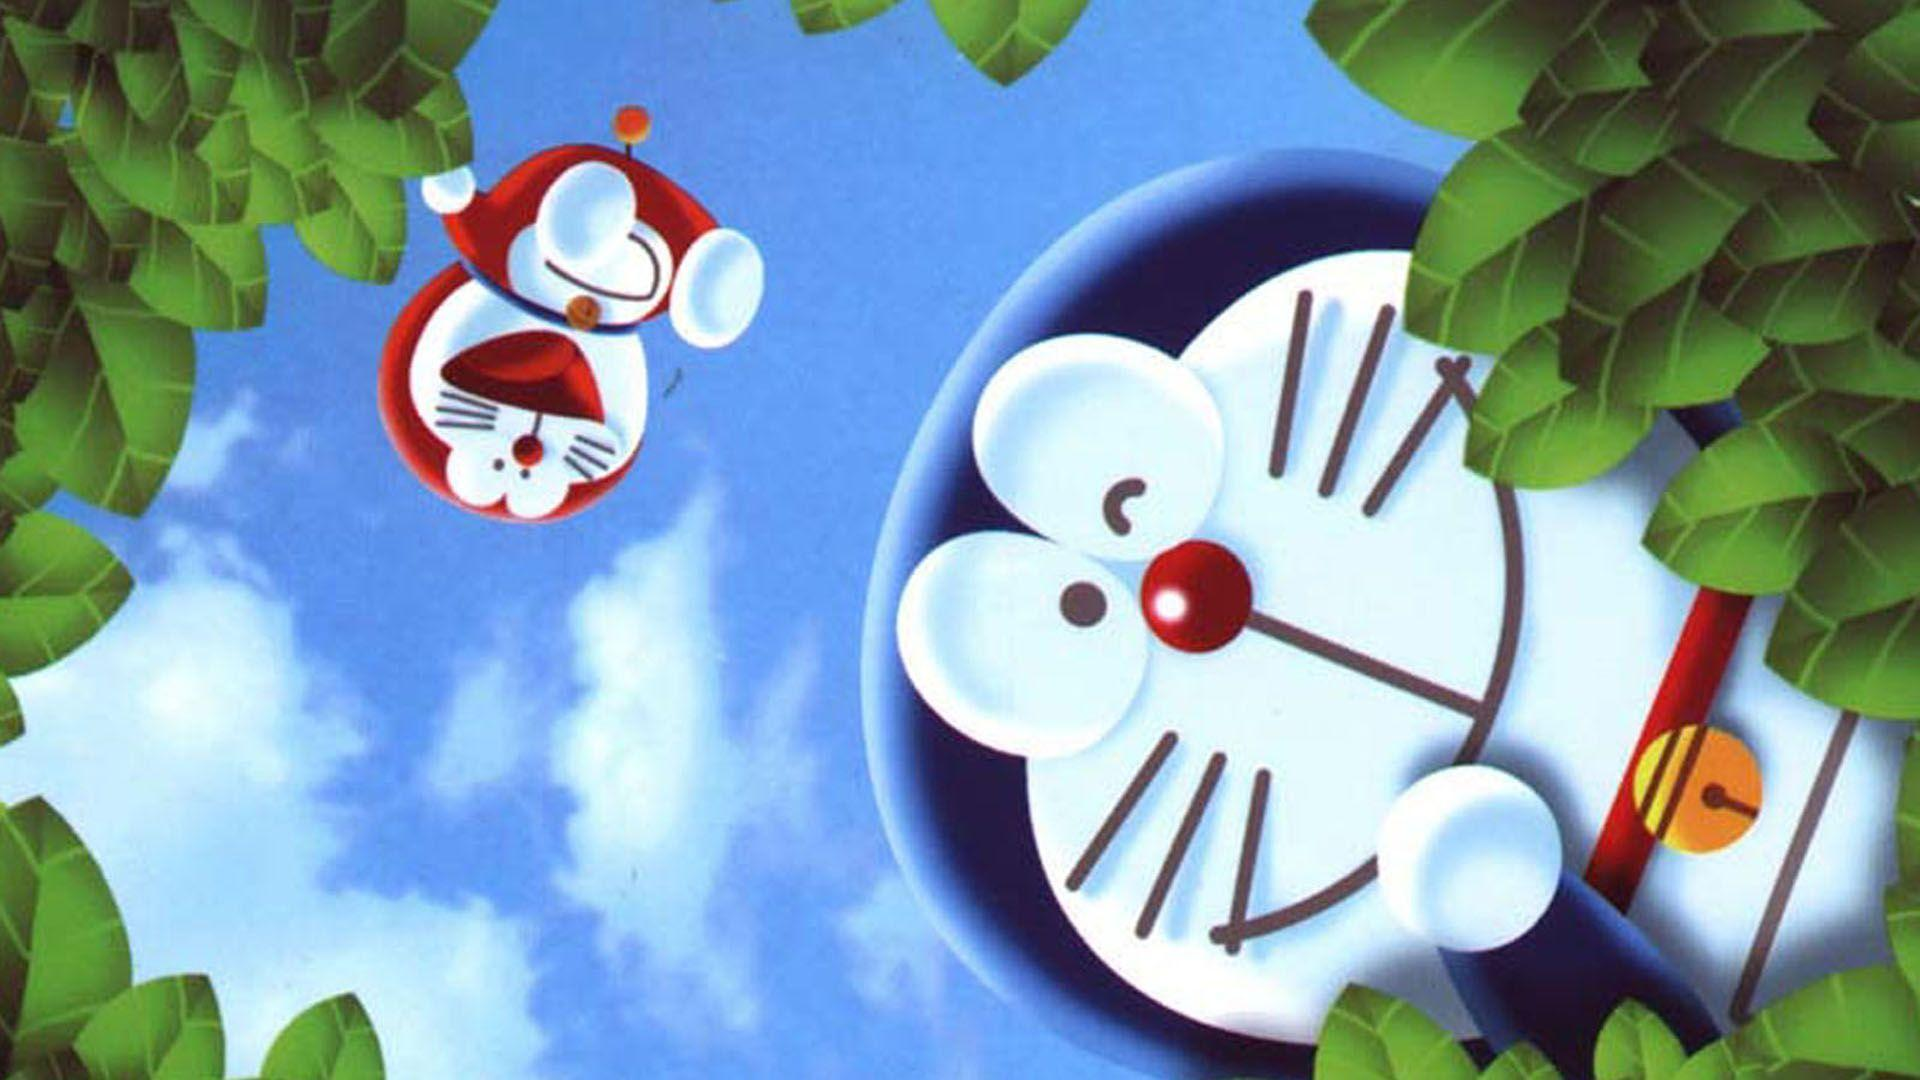 Menakjubkan 28+ Wallpaper Doraemon Hd Laptop - Joen Wallpaper